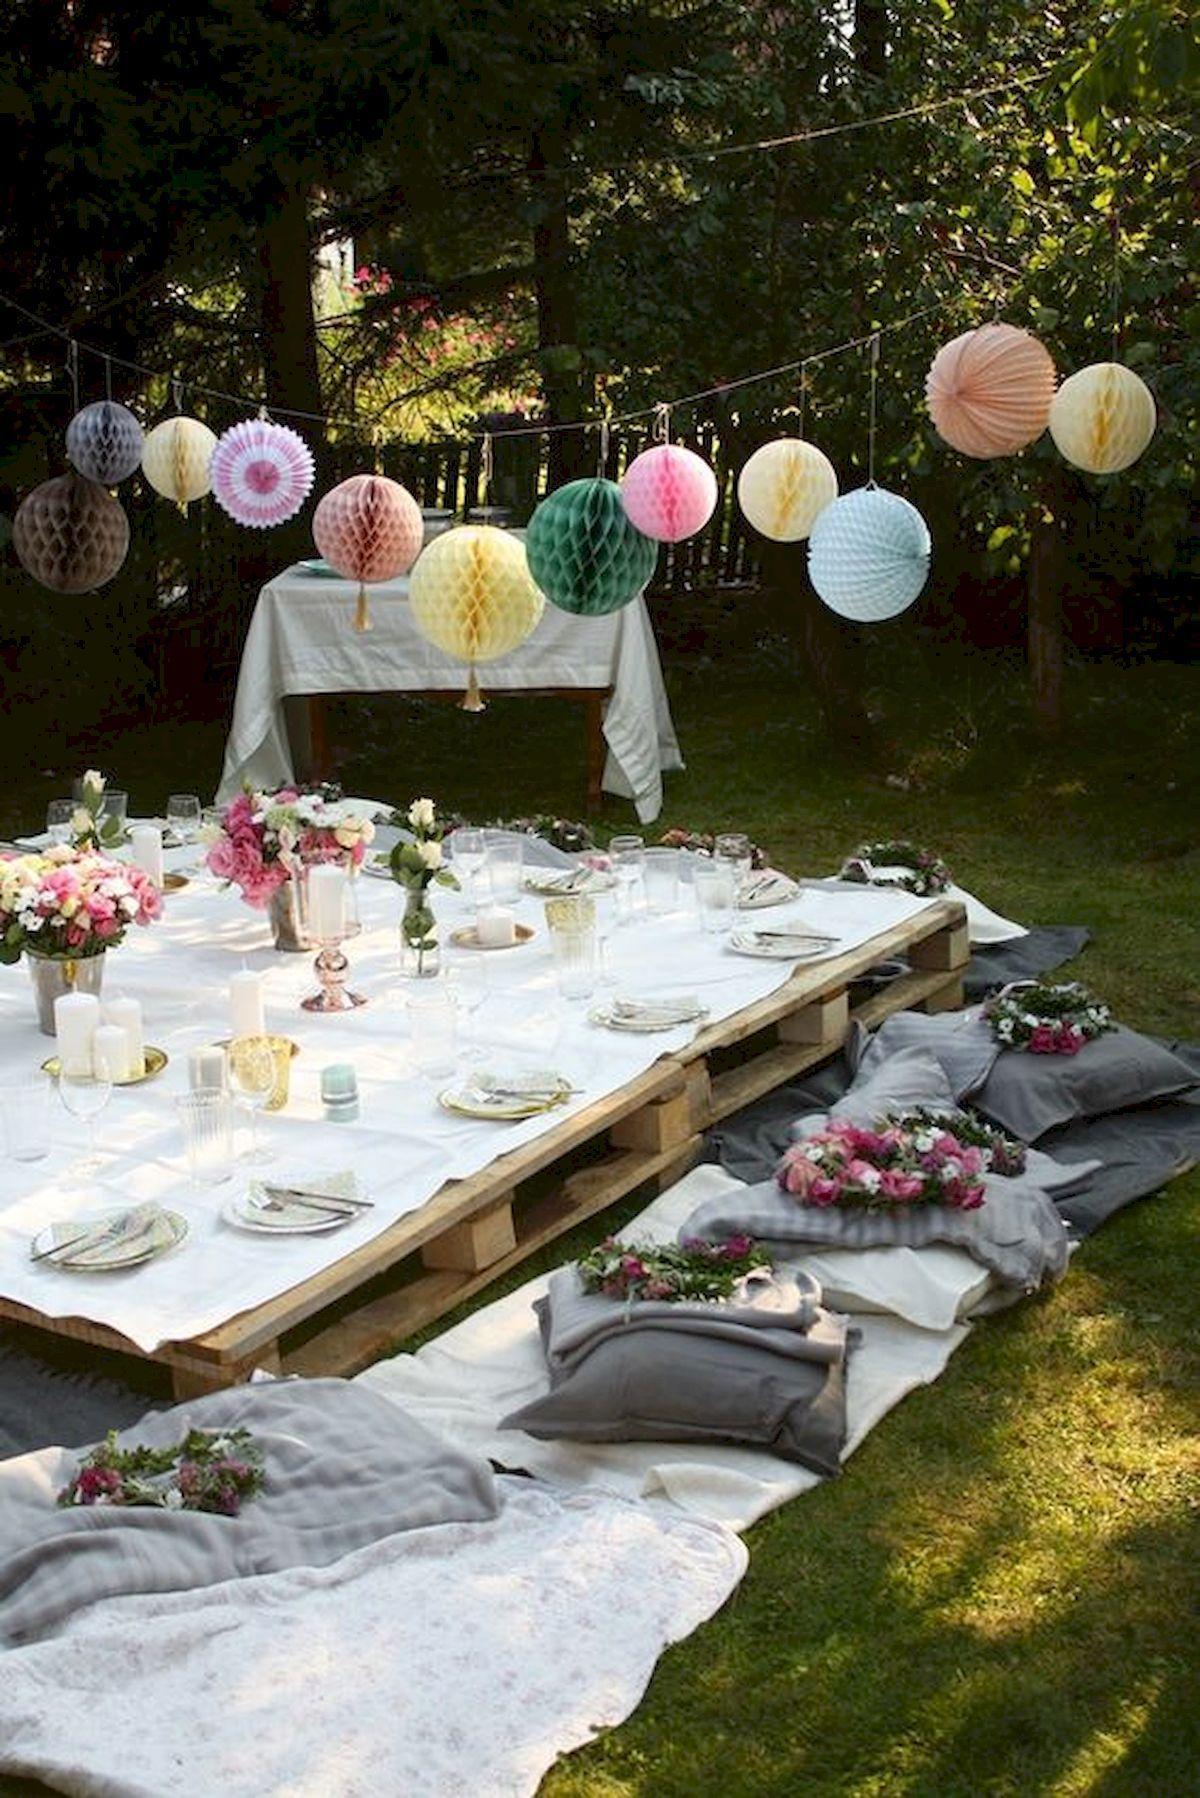 10 Best Summer Party Ideas in Backyards10DECOR  Garden party